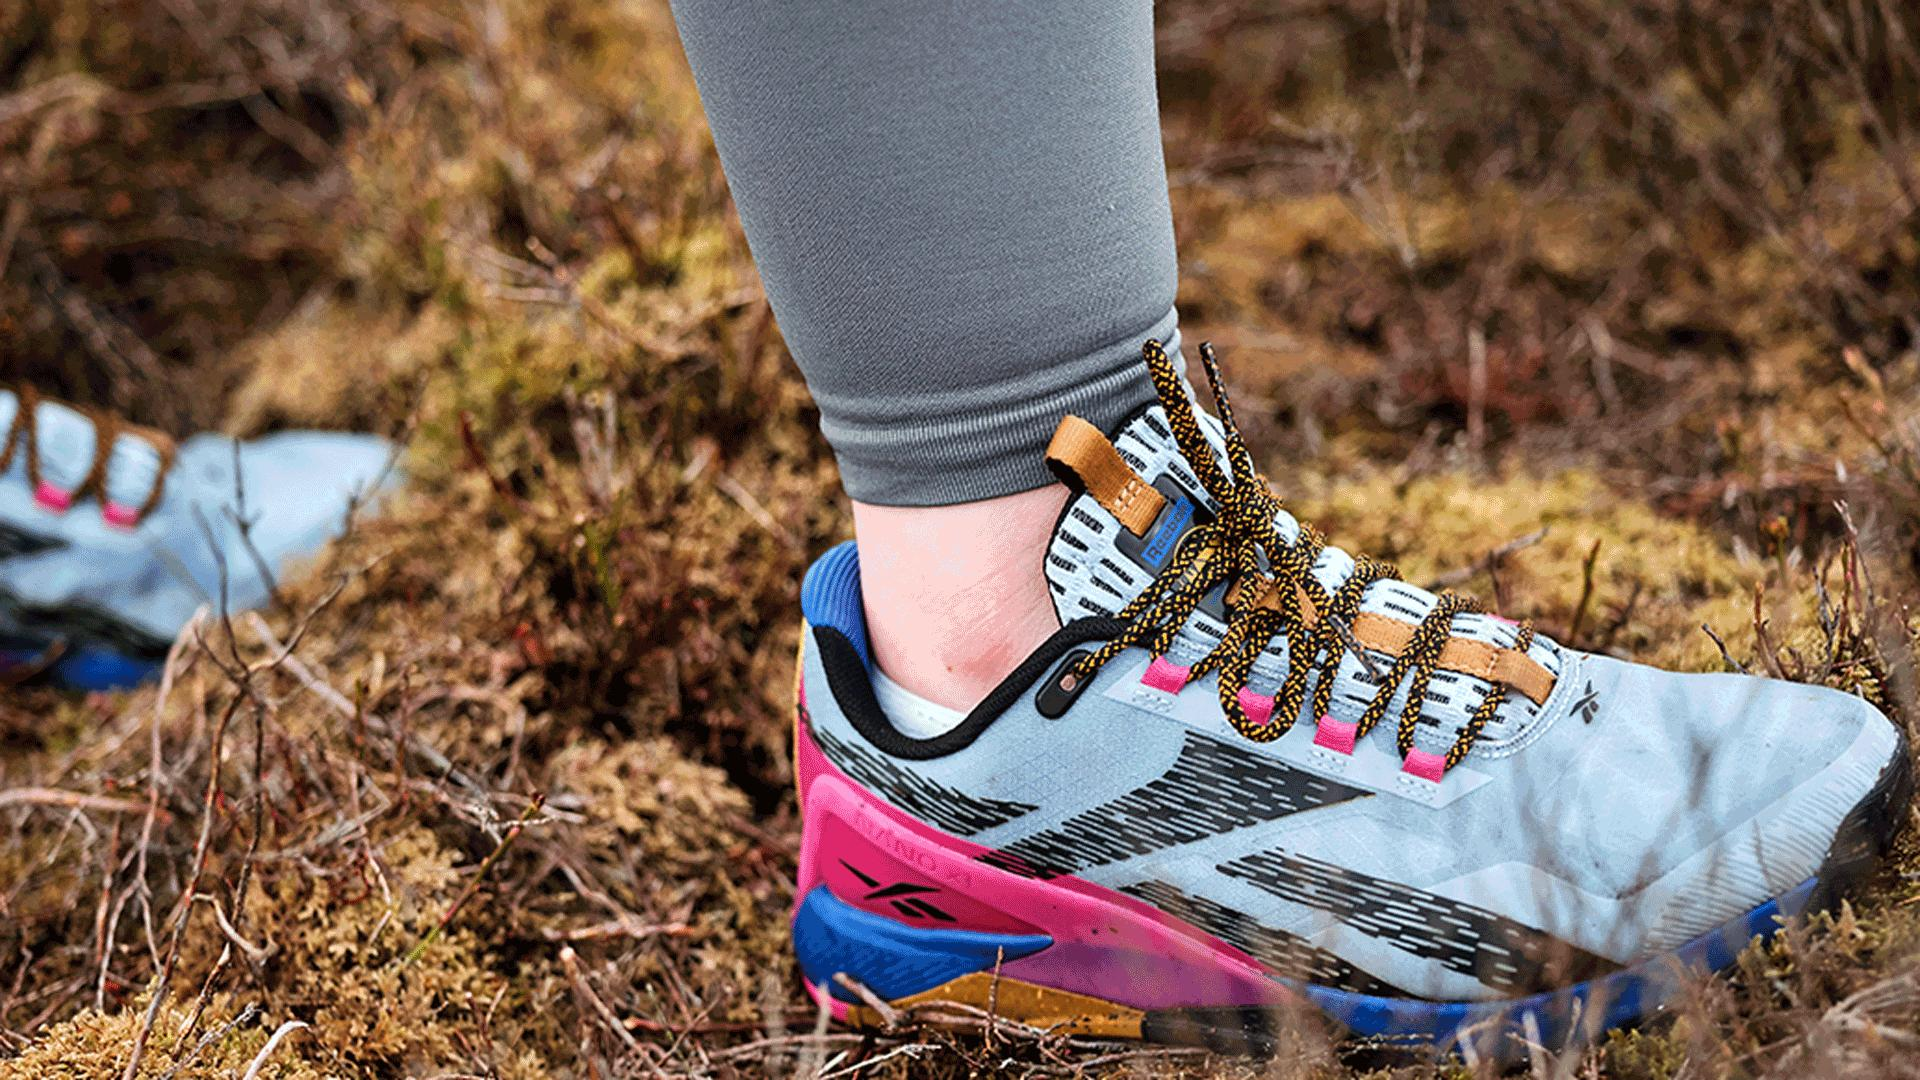 Reebok's Nano X1 Adventure training shoe | Hiking through a field